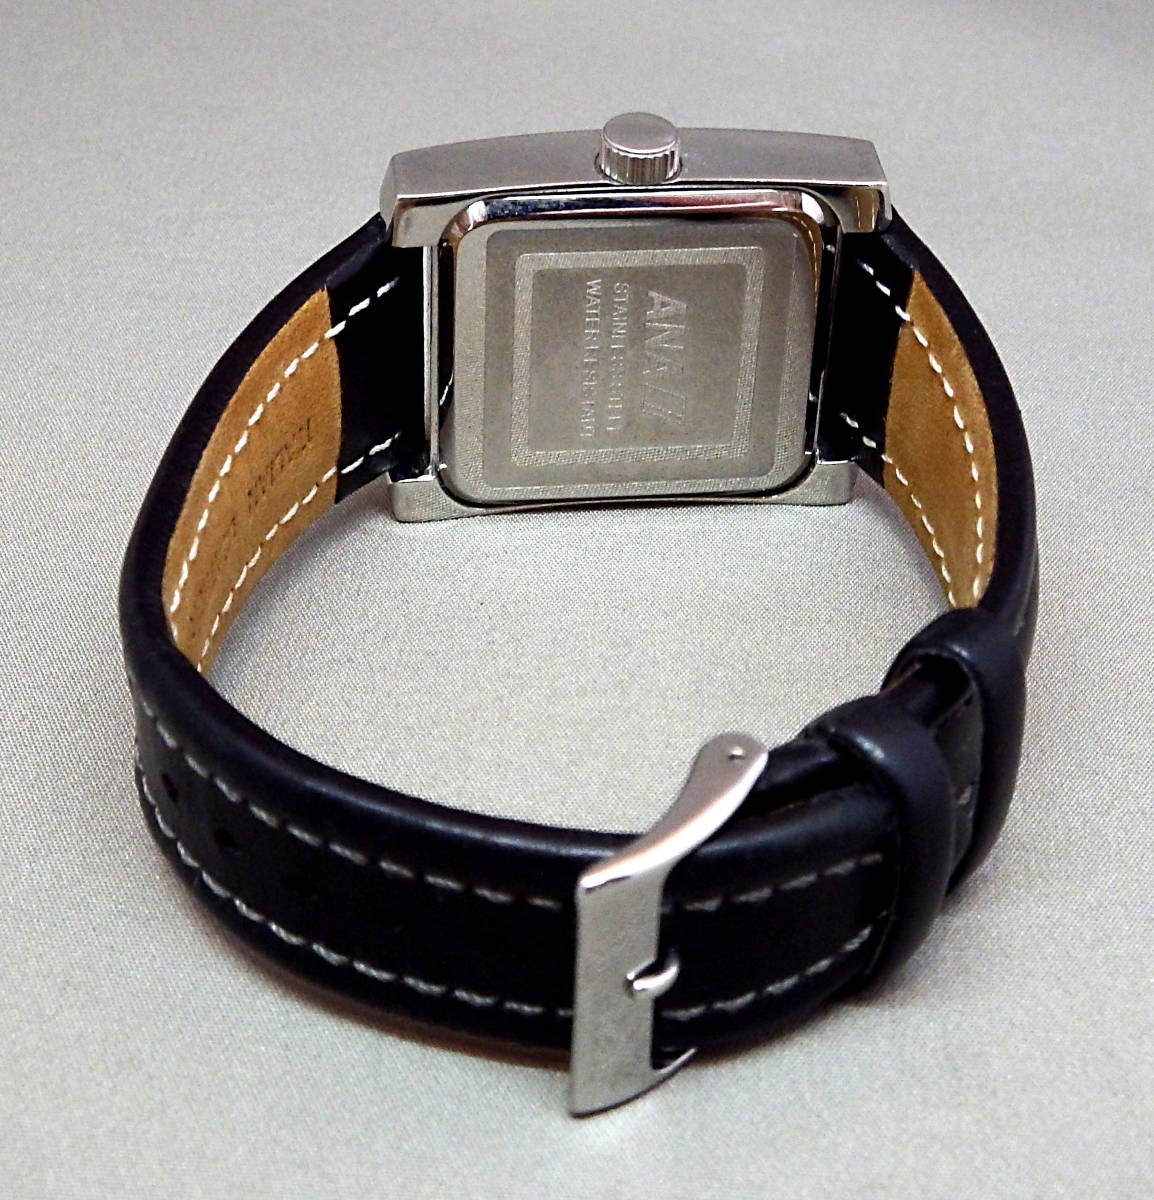 EU-9674■ANA メンズ腕時計 3針カレンダ- 角型 革バンド 中古_画像3